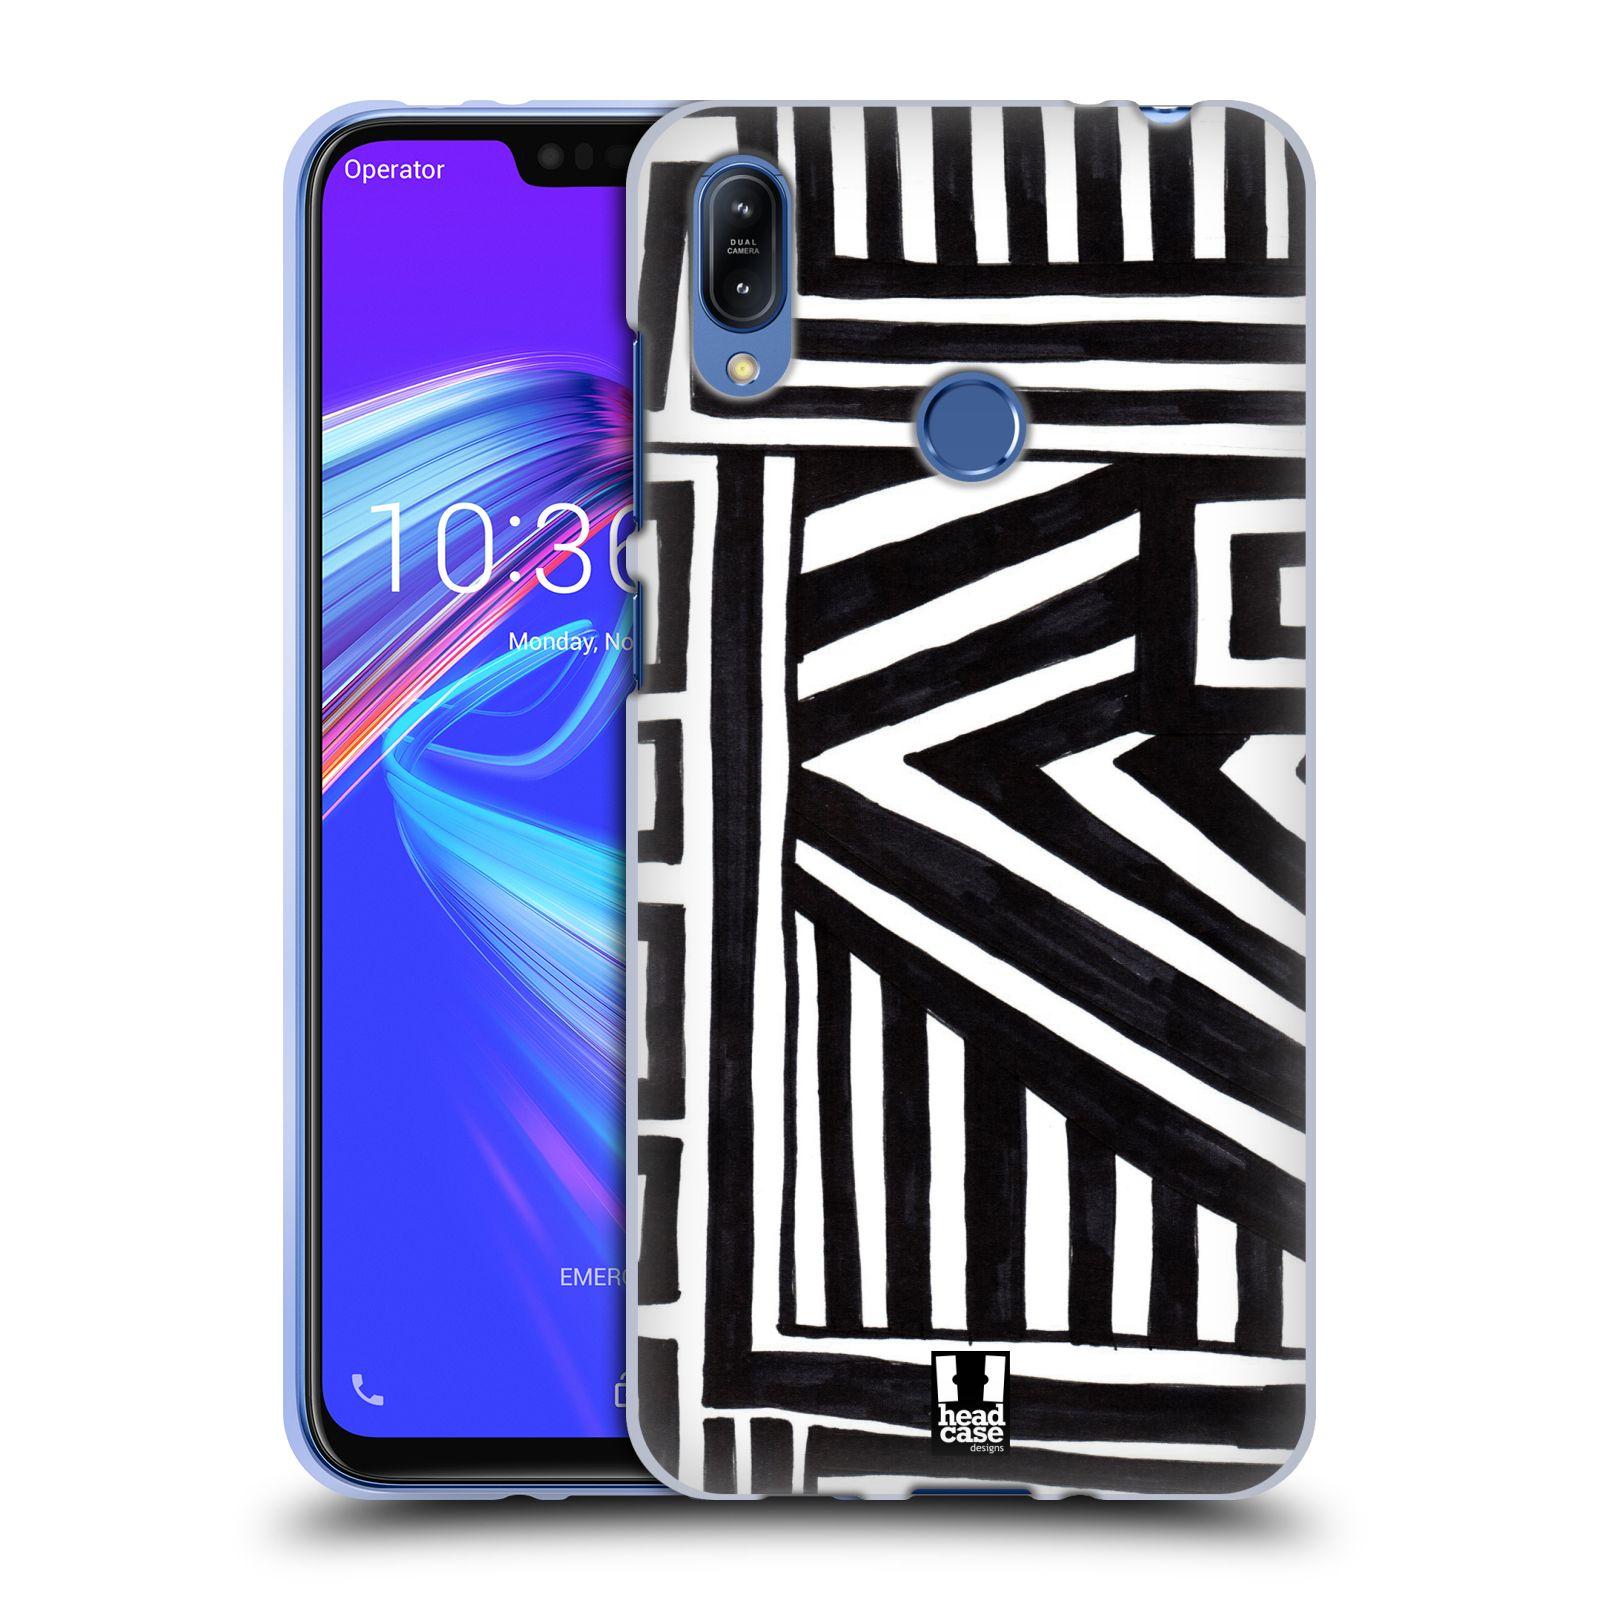 Silikonové pouzdro na mobil Asus Zenfone Max (M2) ZB633KL - Head Case - DOODLE GEOMETRIC